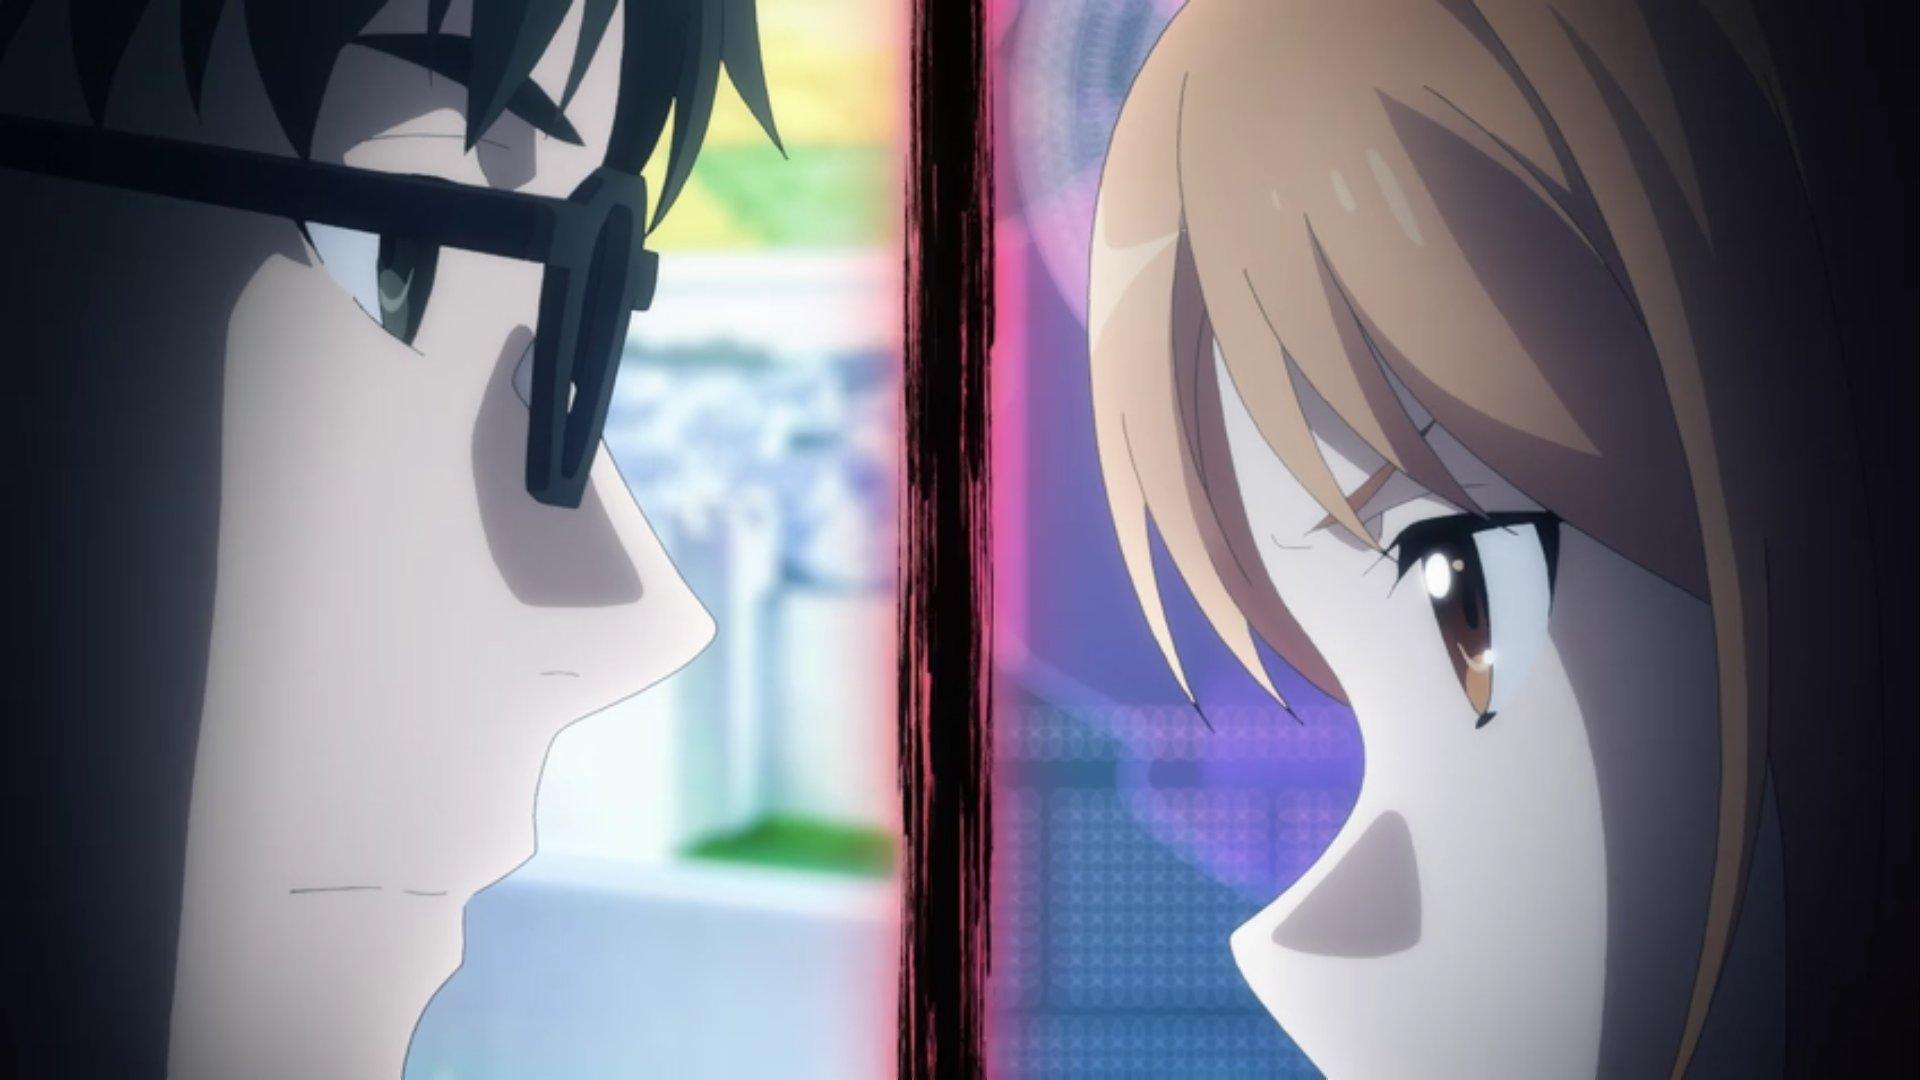 Sword Art Online: Alicization – Episode 6 | LuRa's Anime Blog